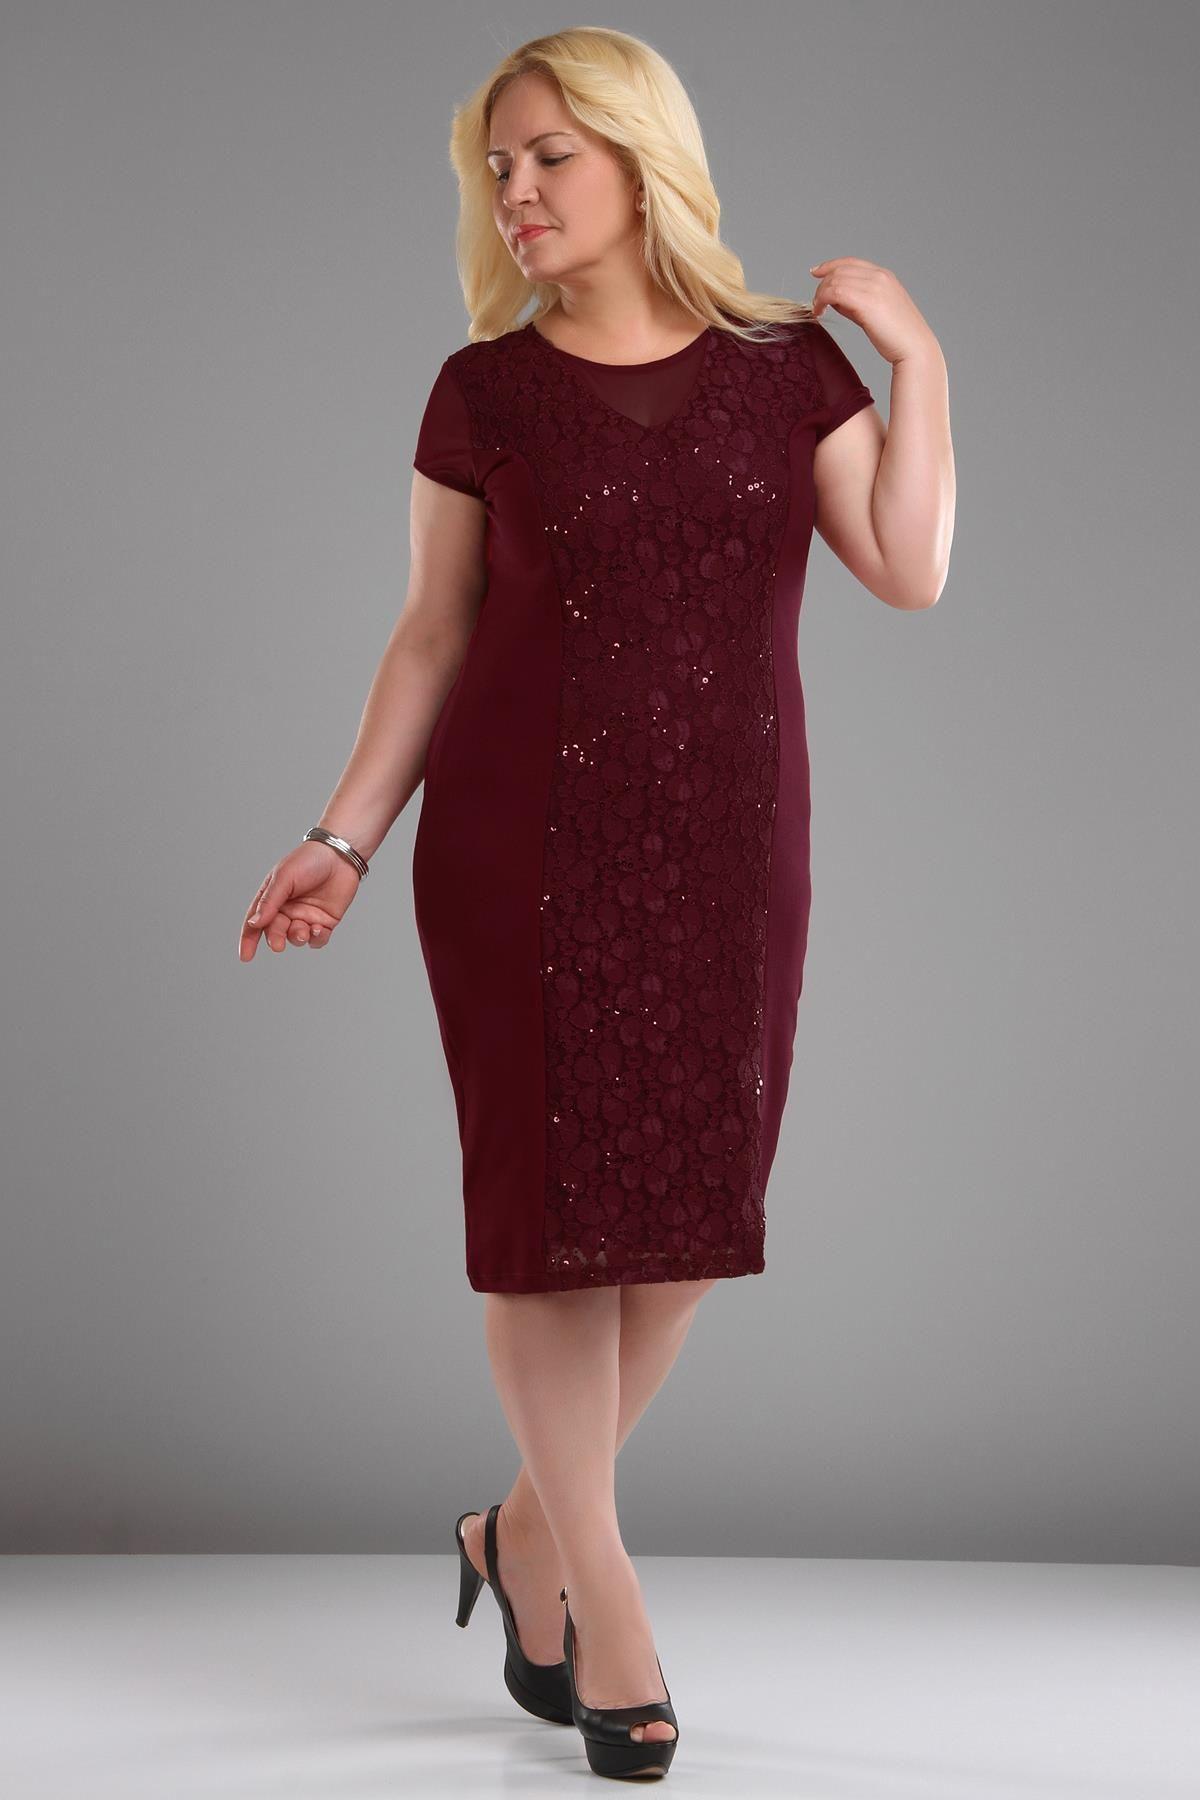 Patirti Pullu Dantel Isleme Tul Detay Elbise Elbise Elbise Modelleri Giyim